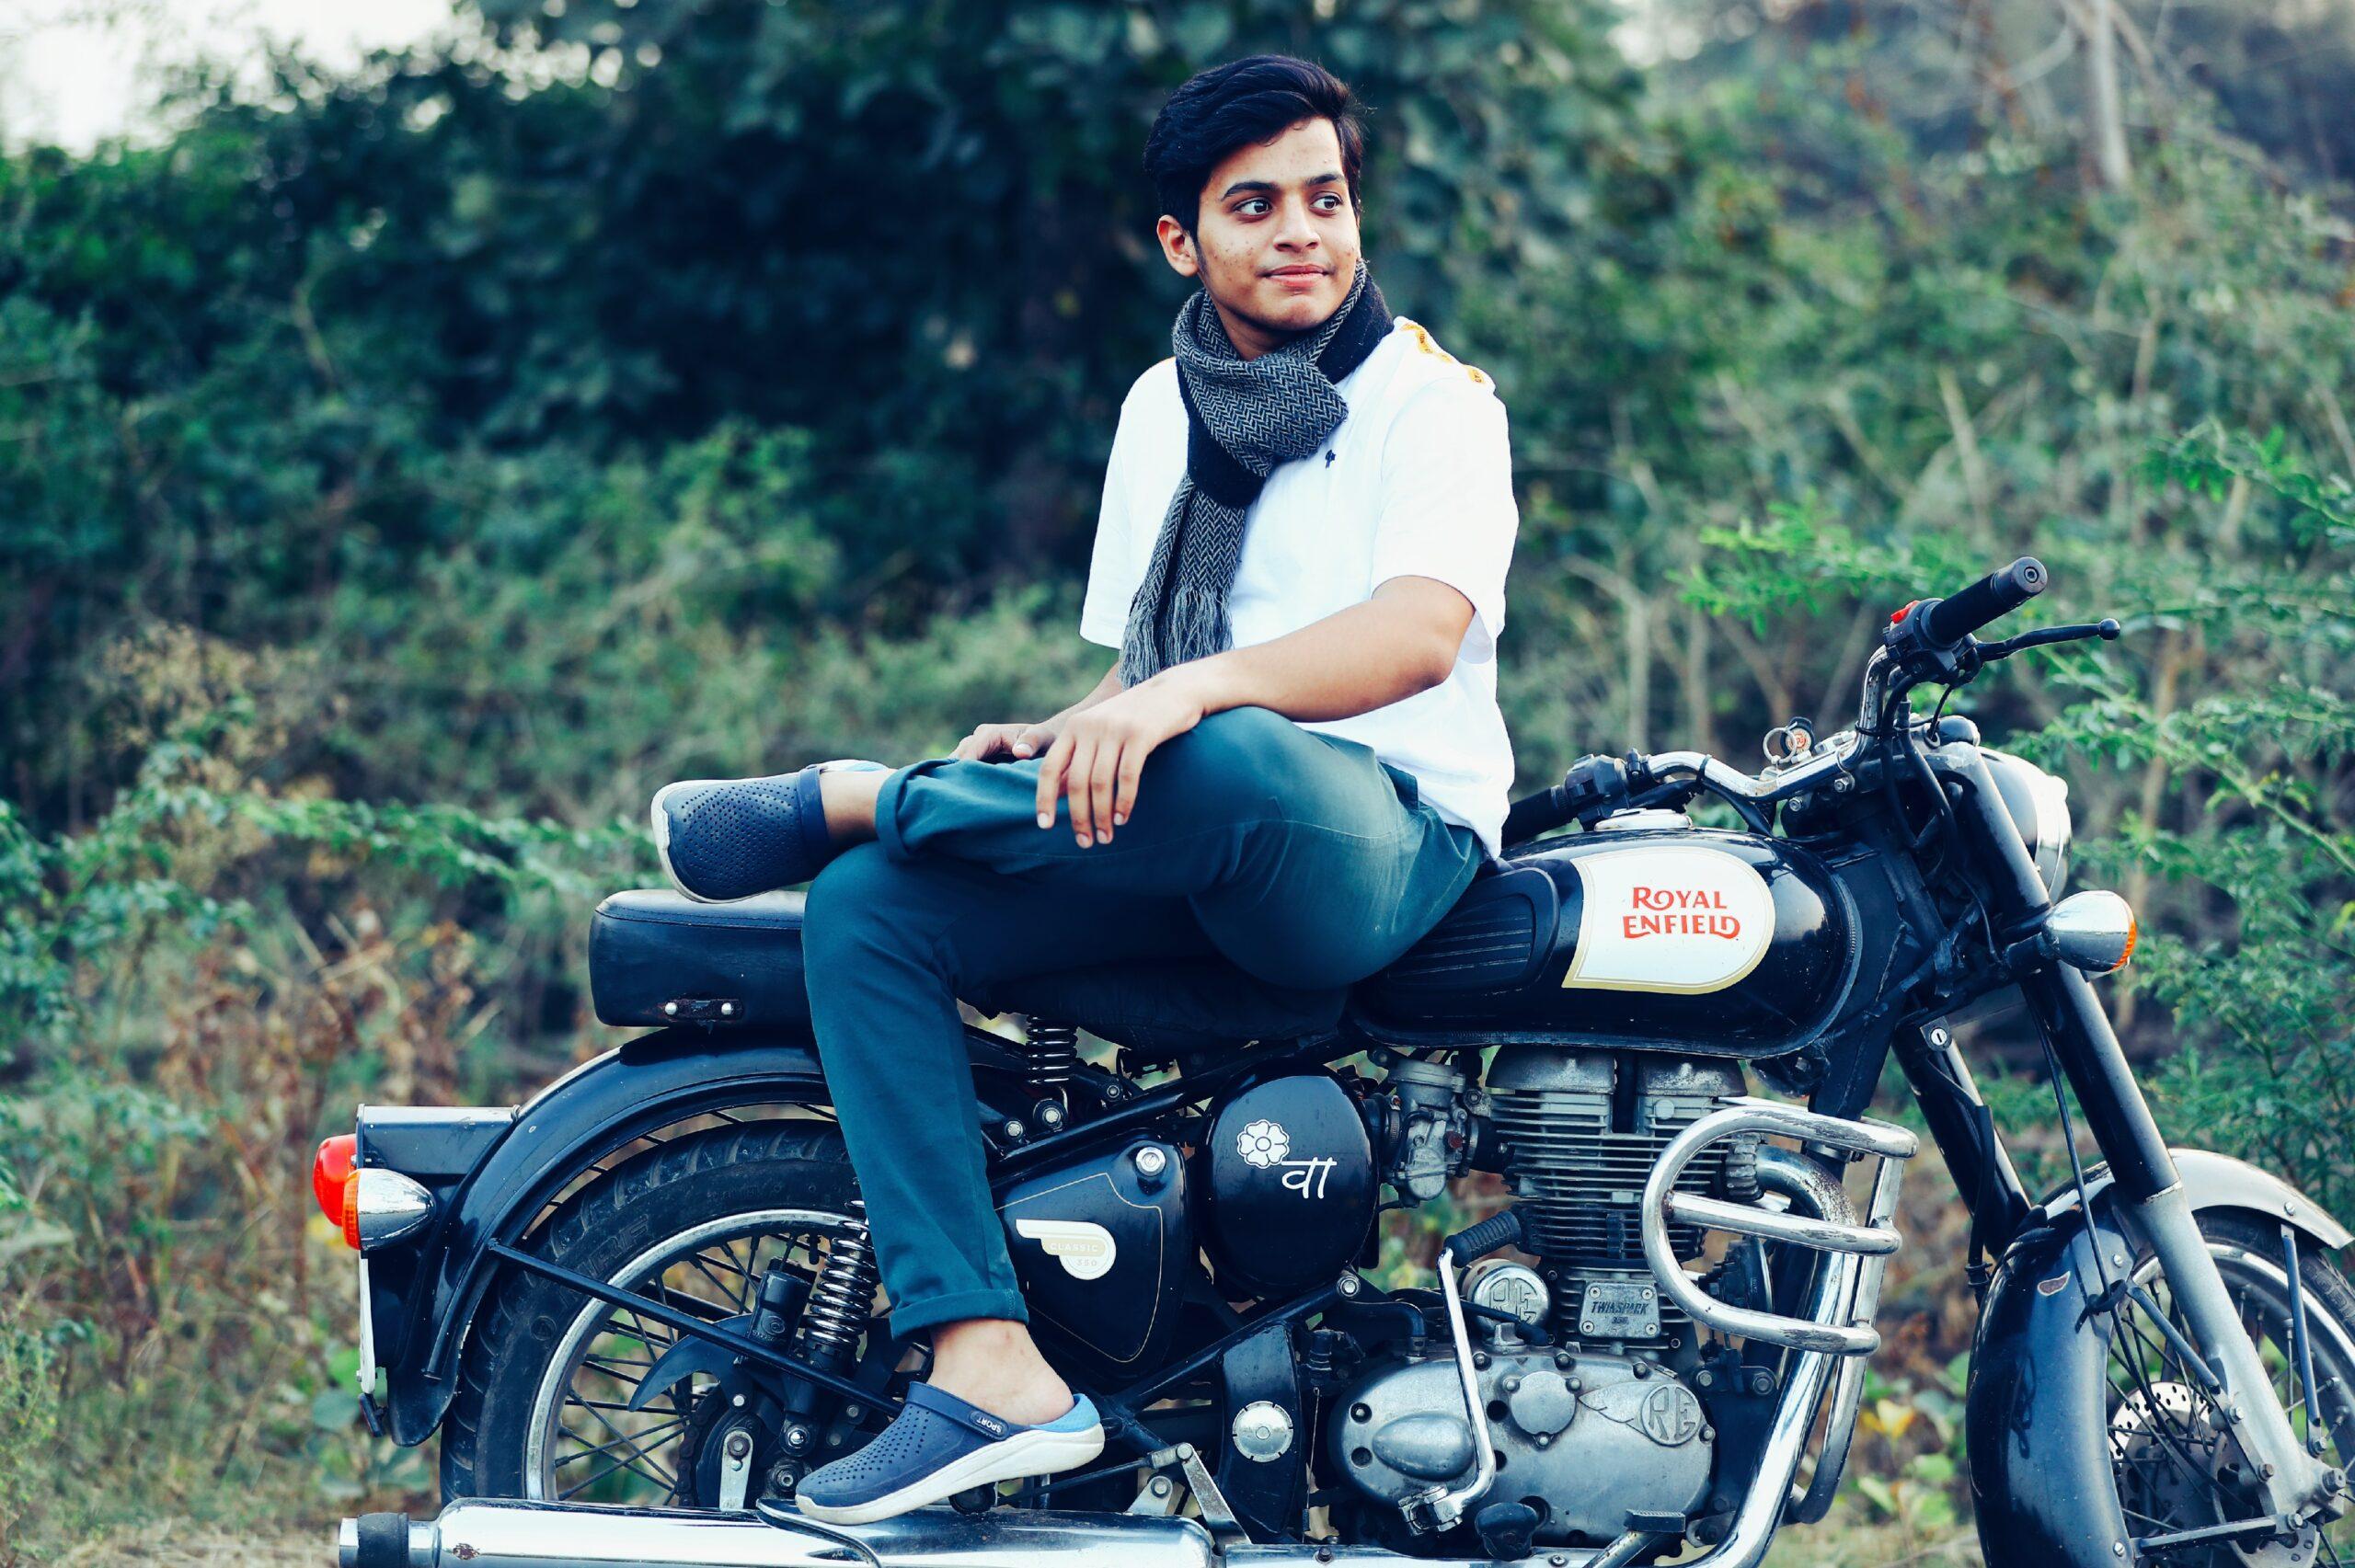 Nikunj Agarwal the digital marketing expert